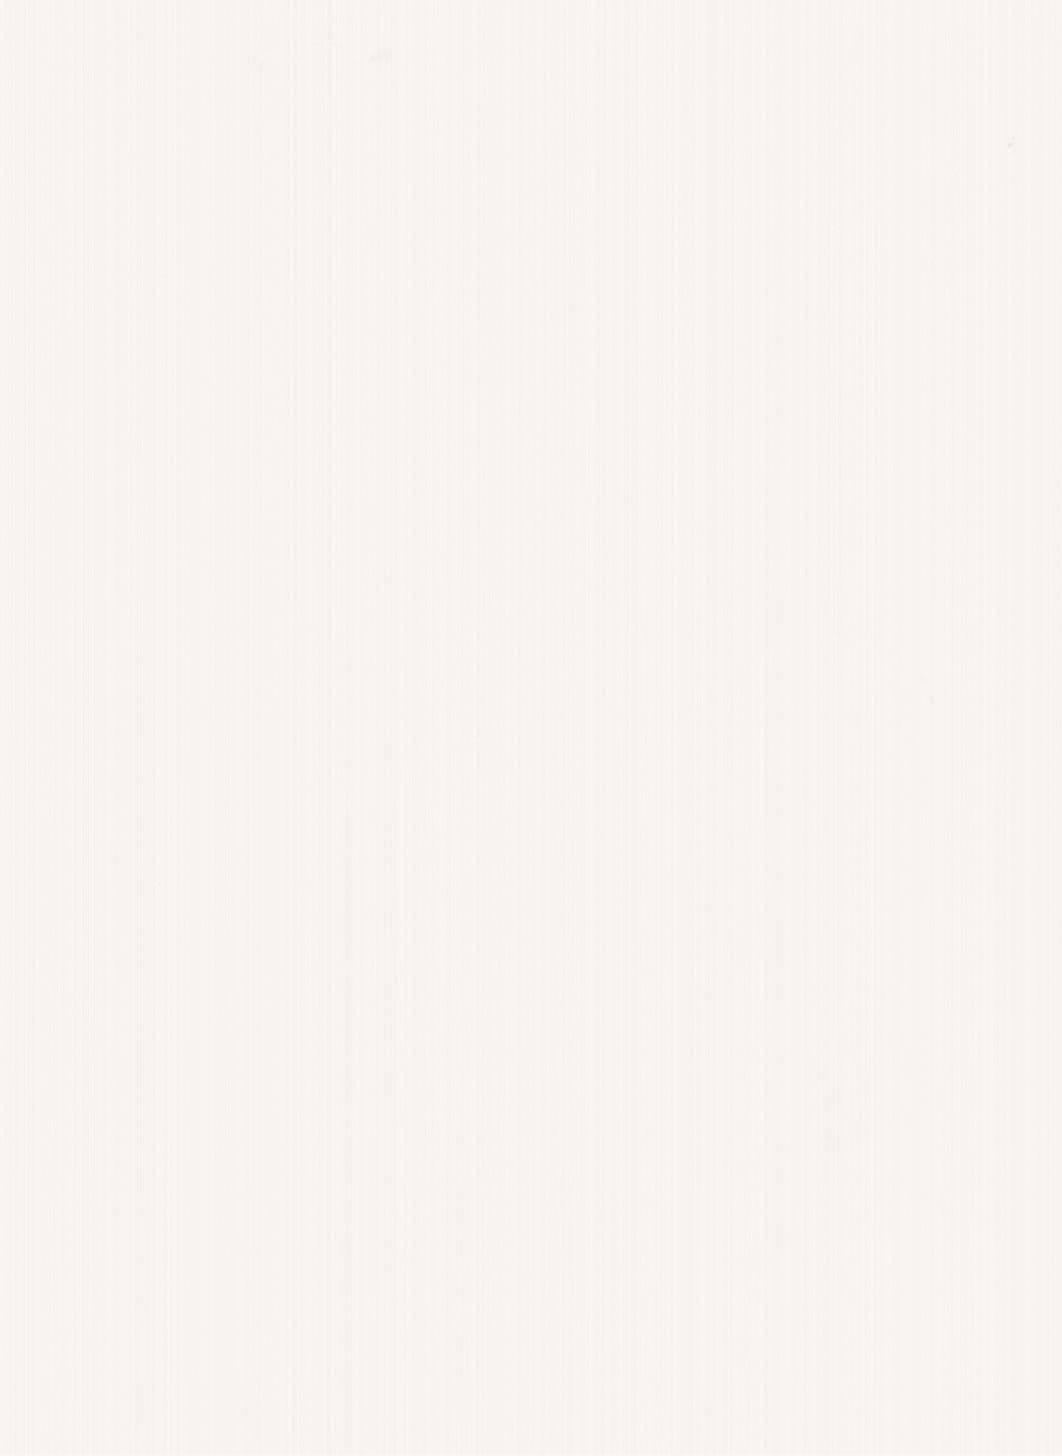 Обои Cole & Son Festival Stripes 96/10052, интернет магазин Волео